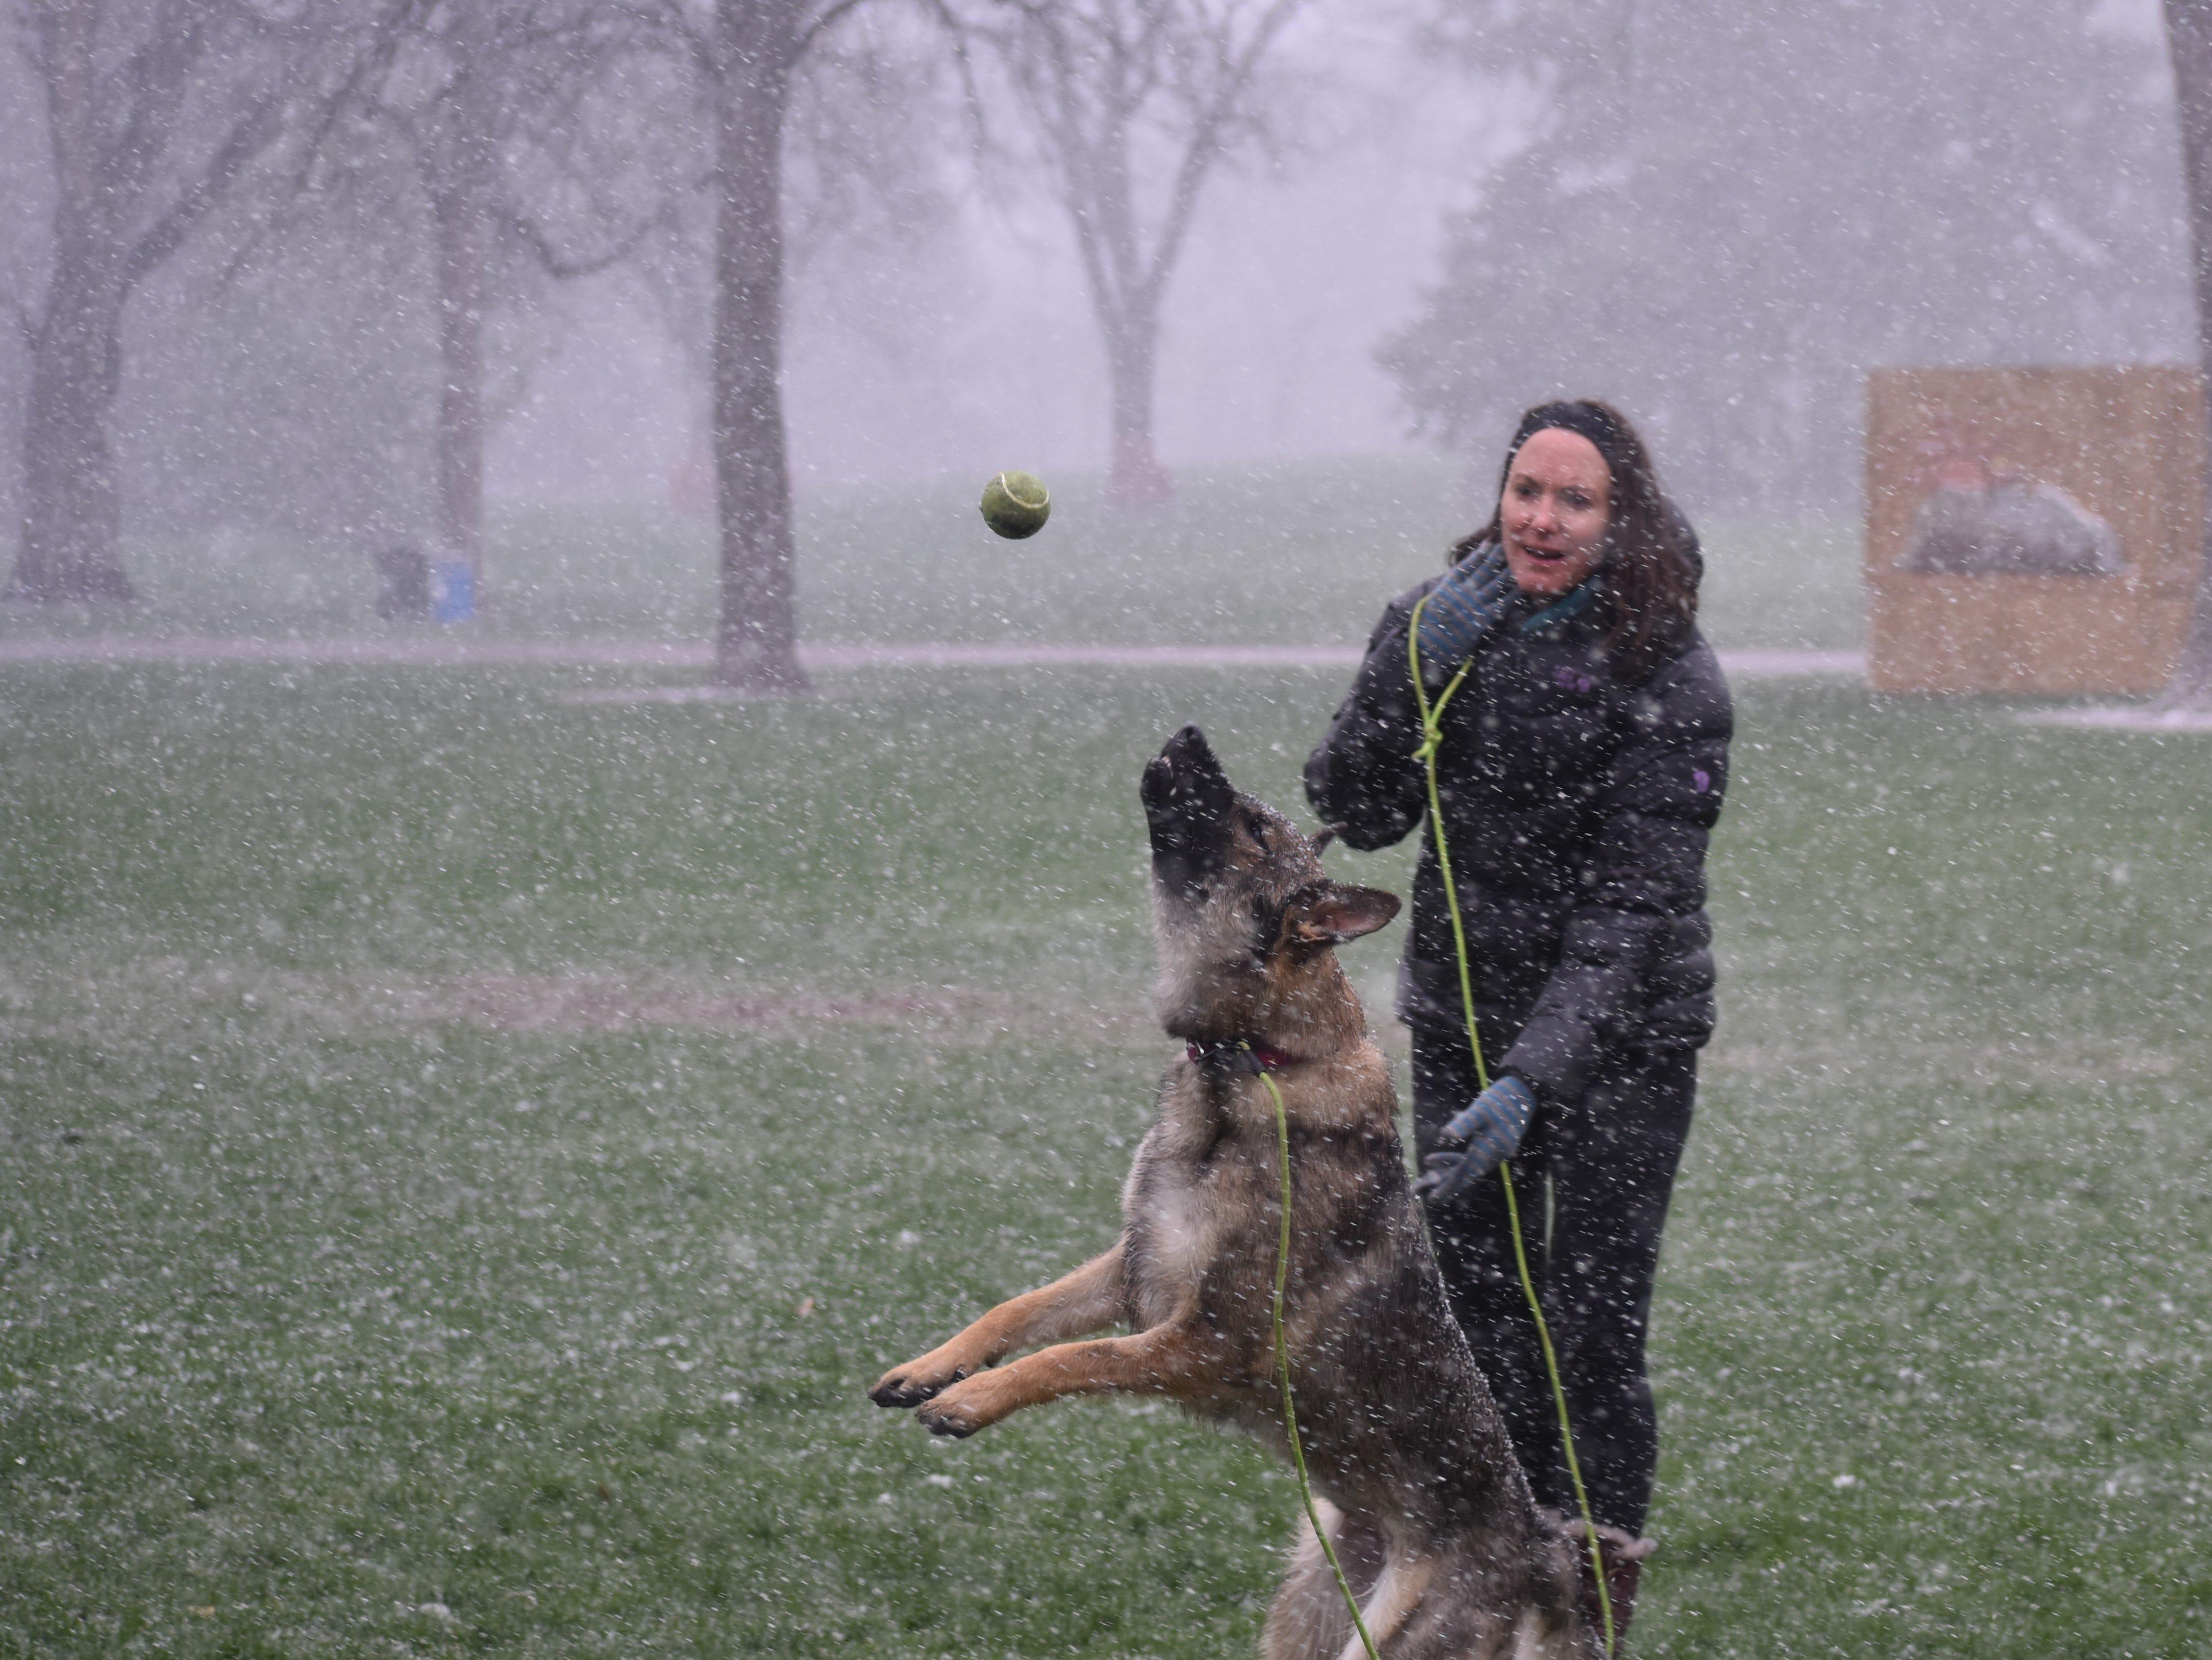 Elizabeth Harrison of Fort Collins and German shepherd Margot enjoy the snow at City Park on Monday.